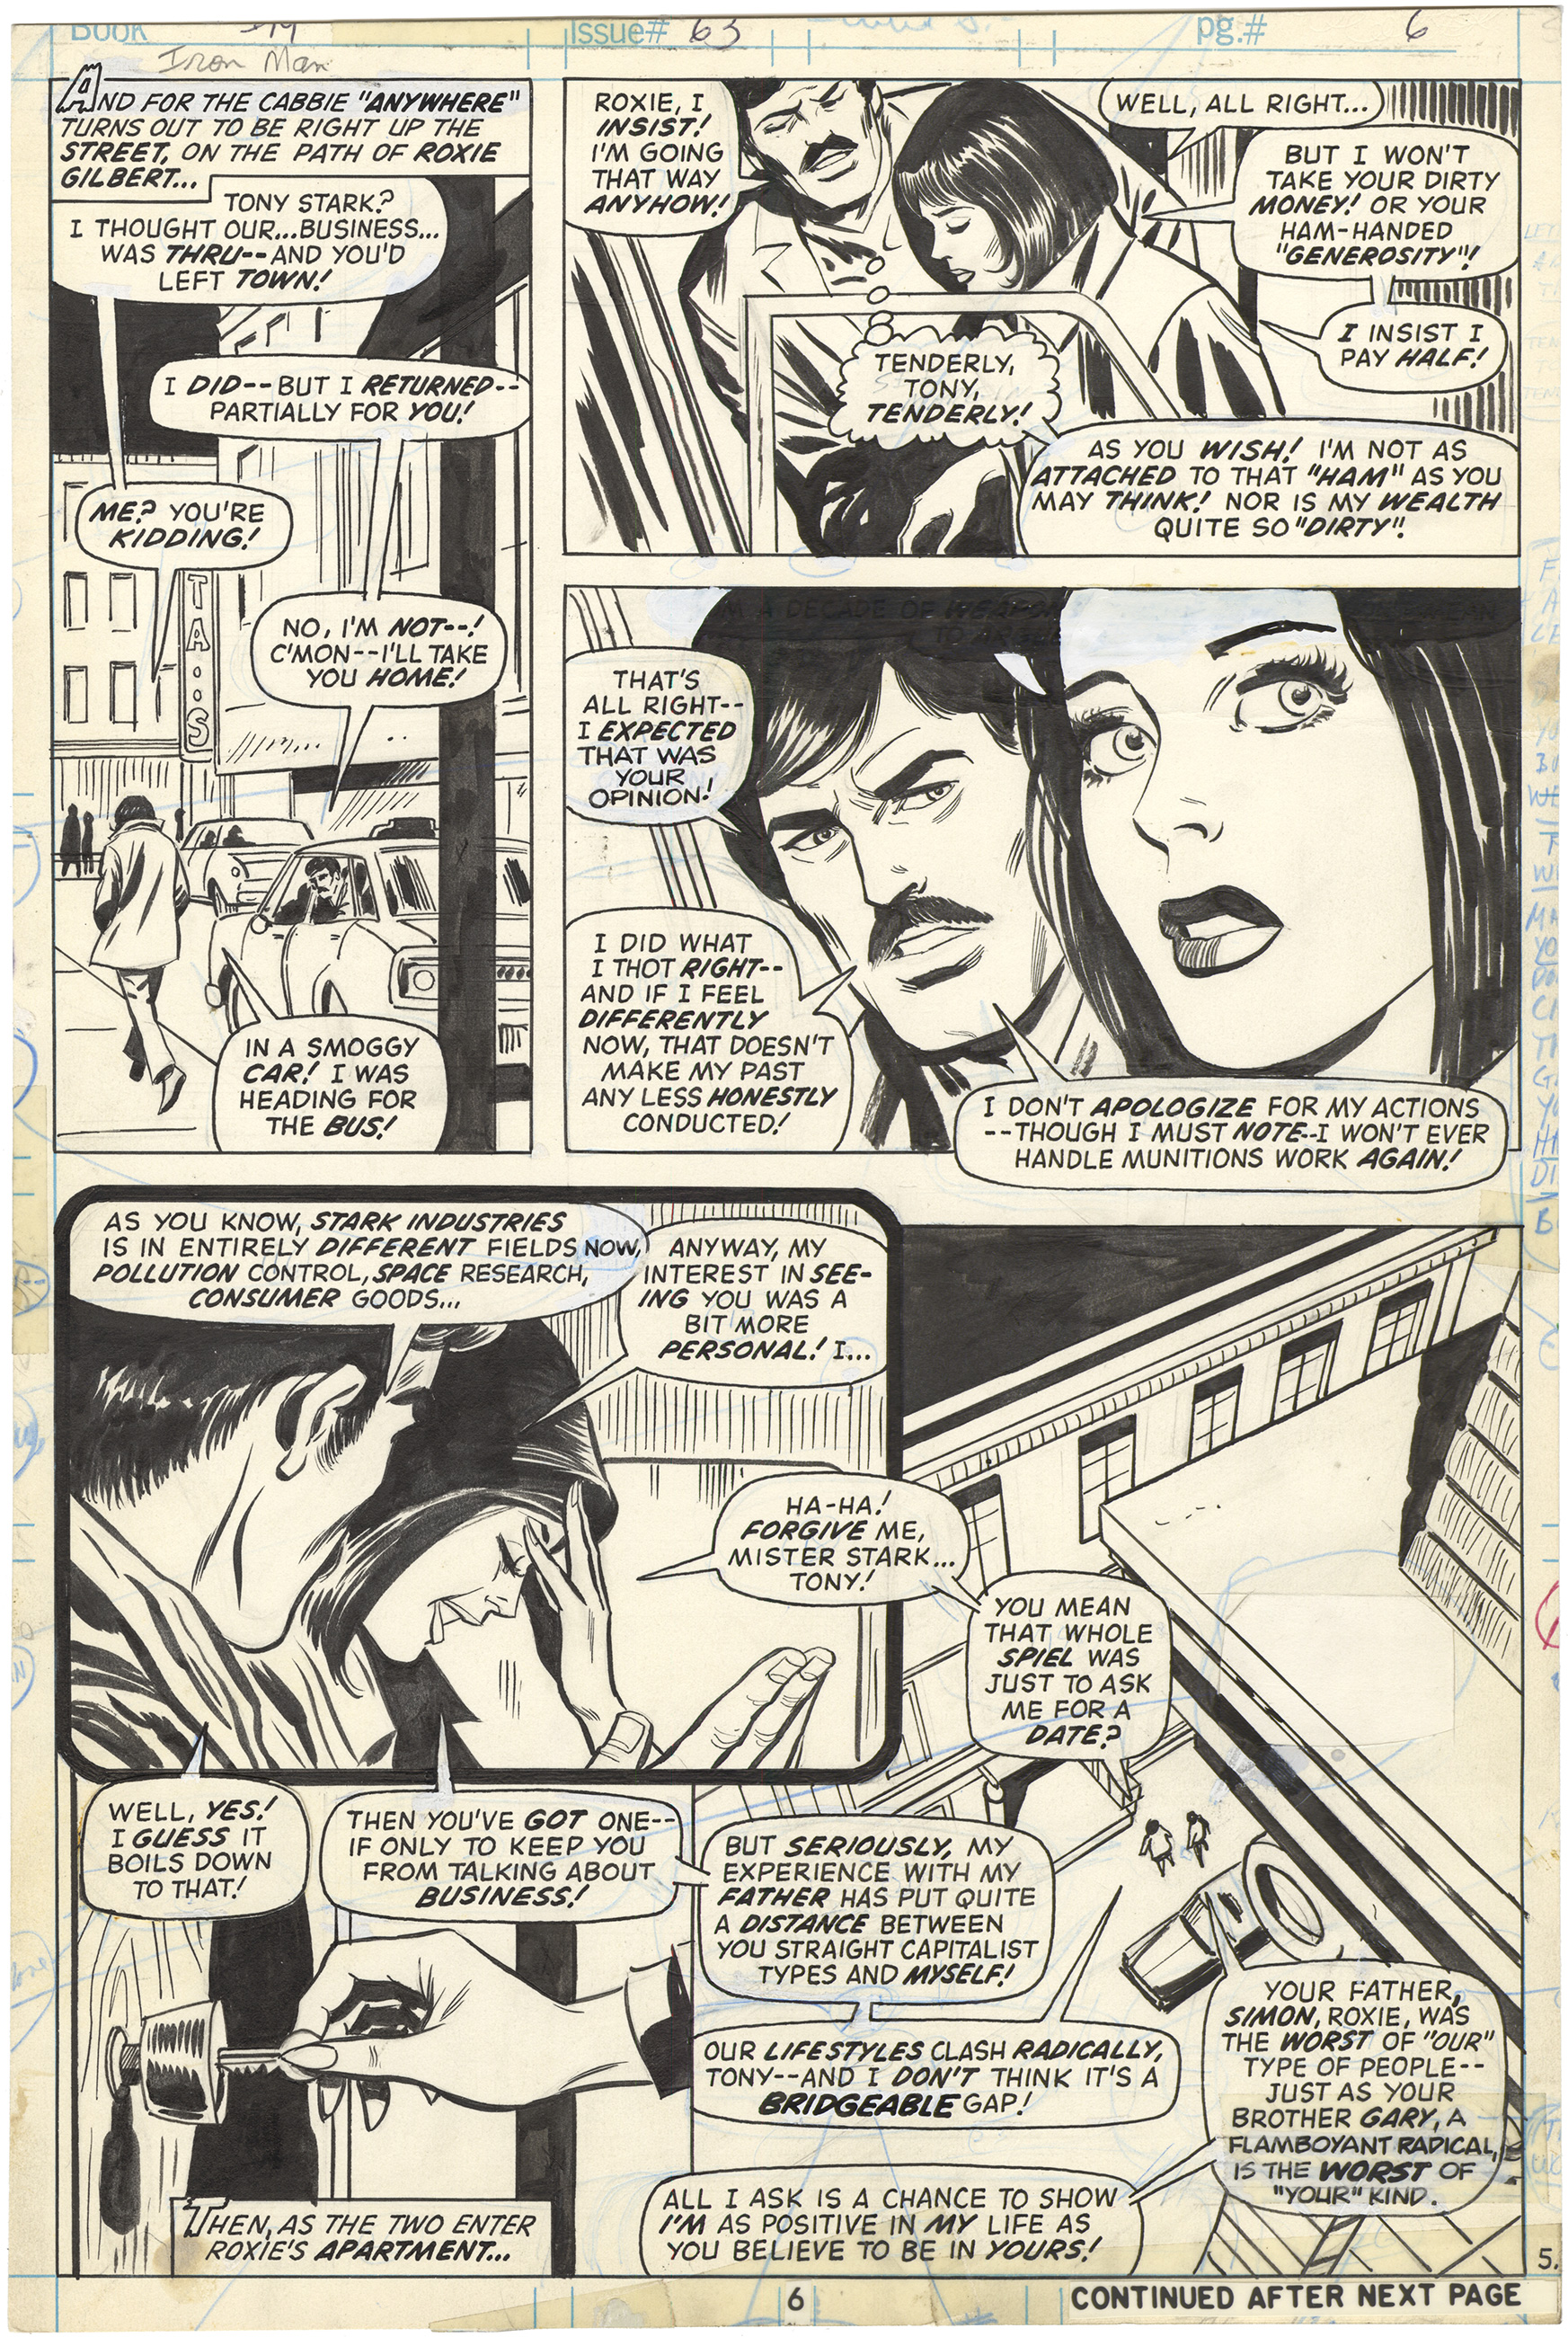 Iron Man #63 p6